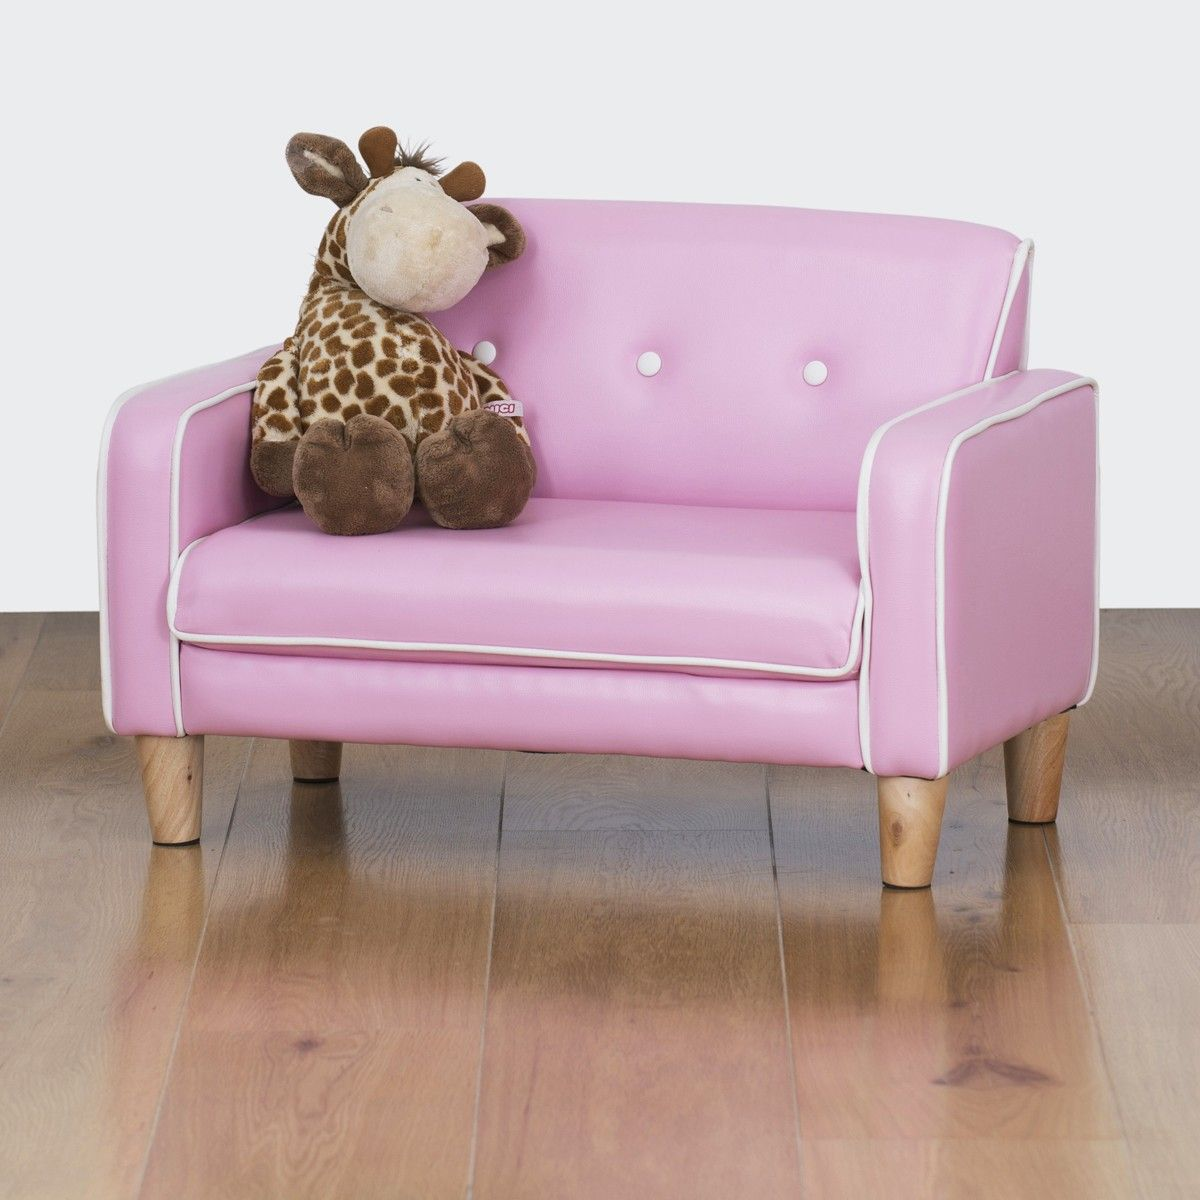 Elegant El Nino Kids Sofa   Bubblegum Pink   $99.00